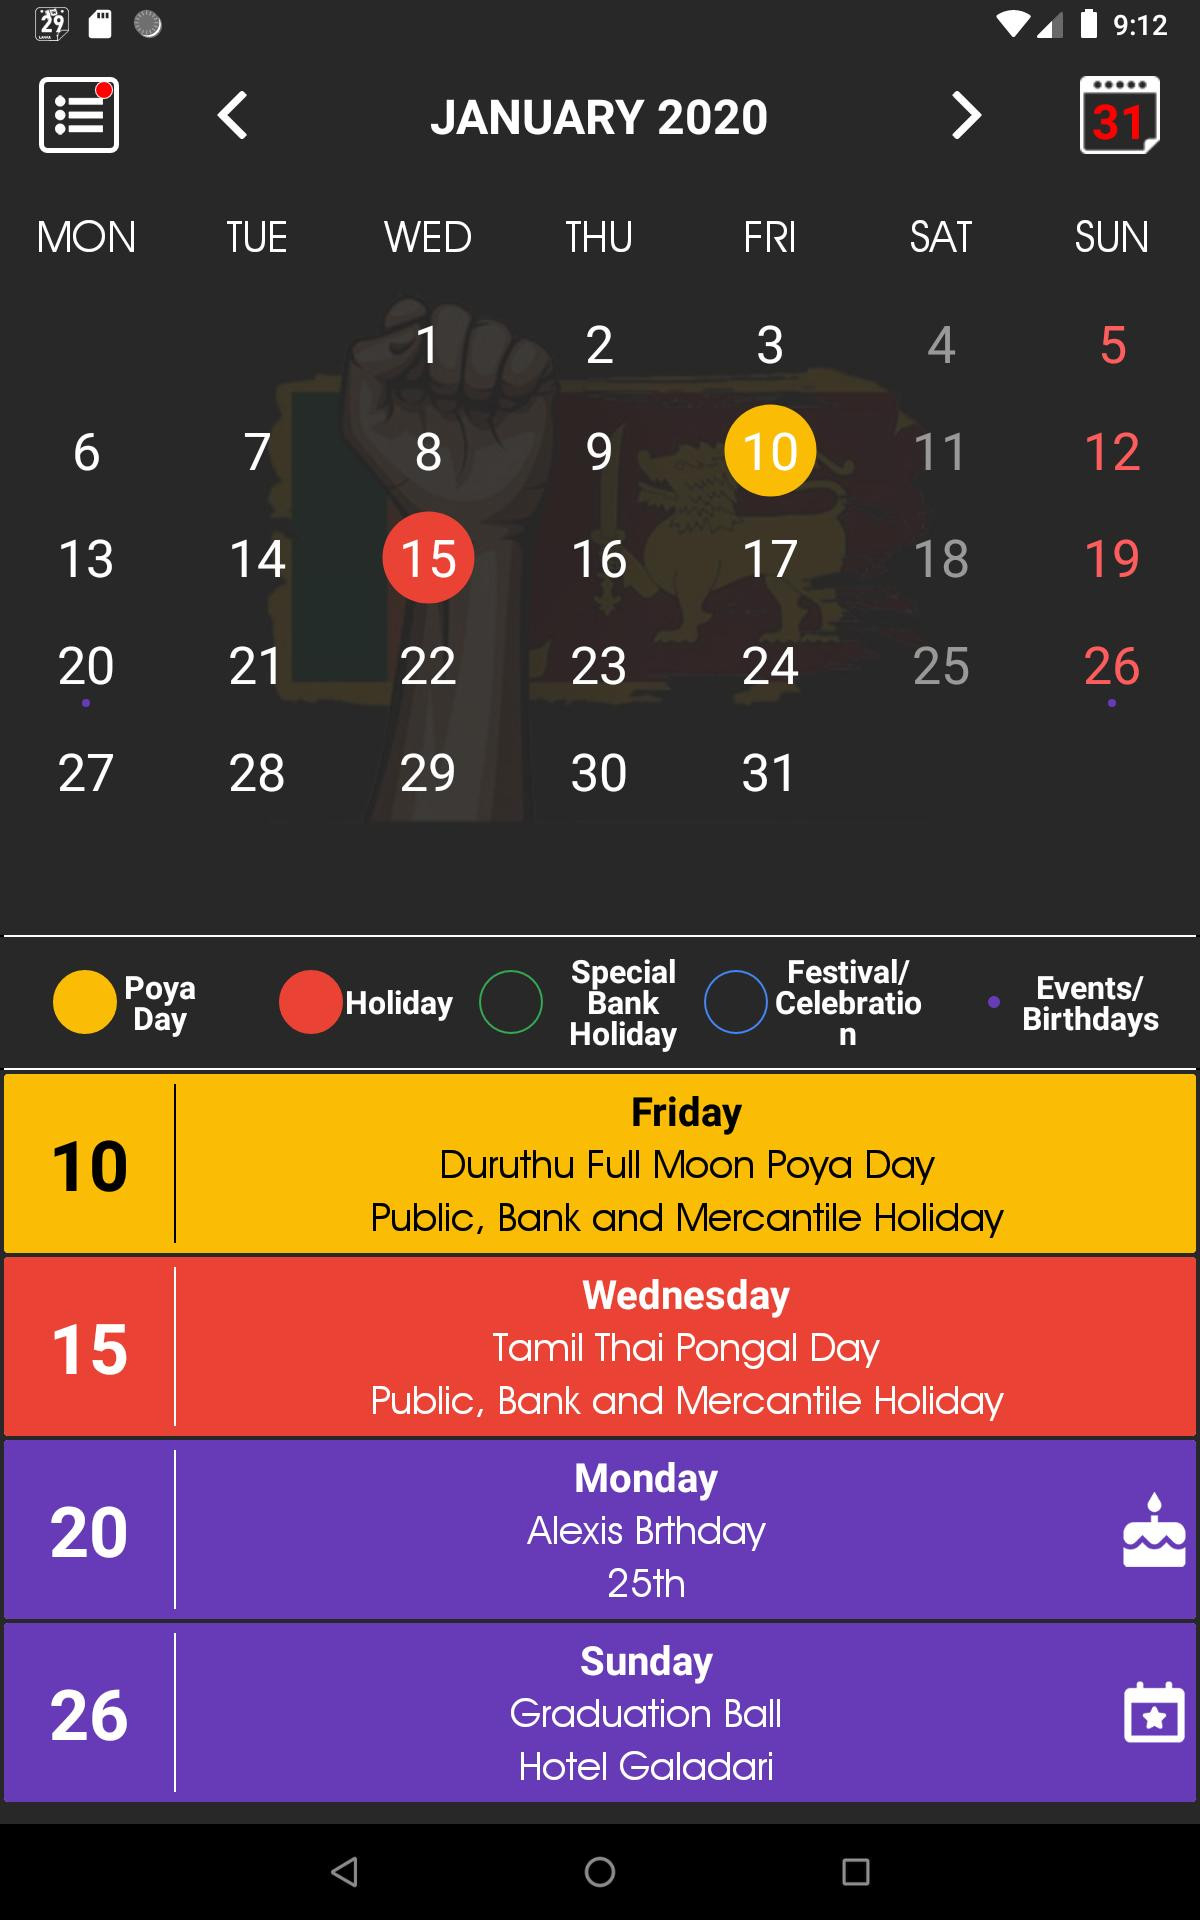 Sri Lanka Calendar 2021 🇱🇰 ¦ Sinhala ¦ Holidays For-2021 Holidays Mercantile Sl